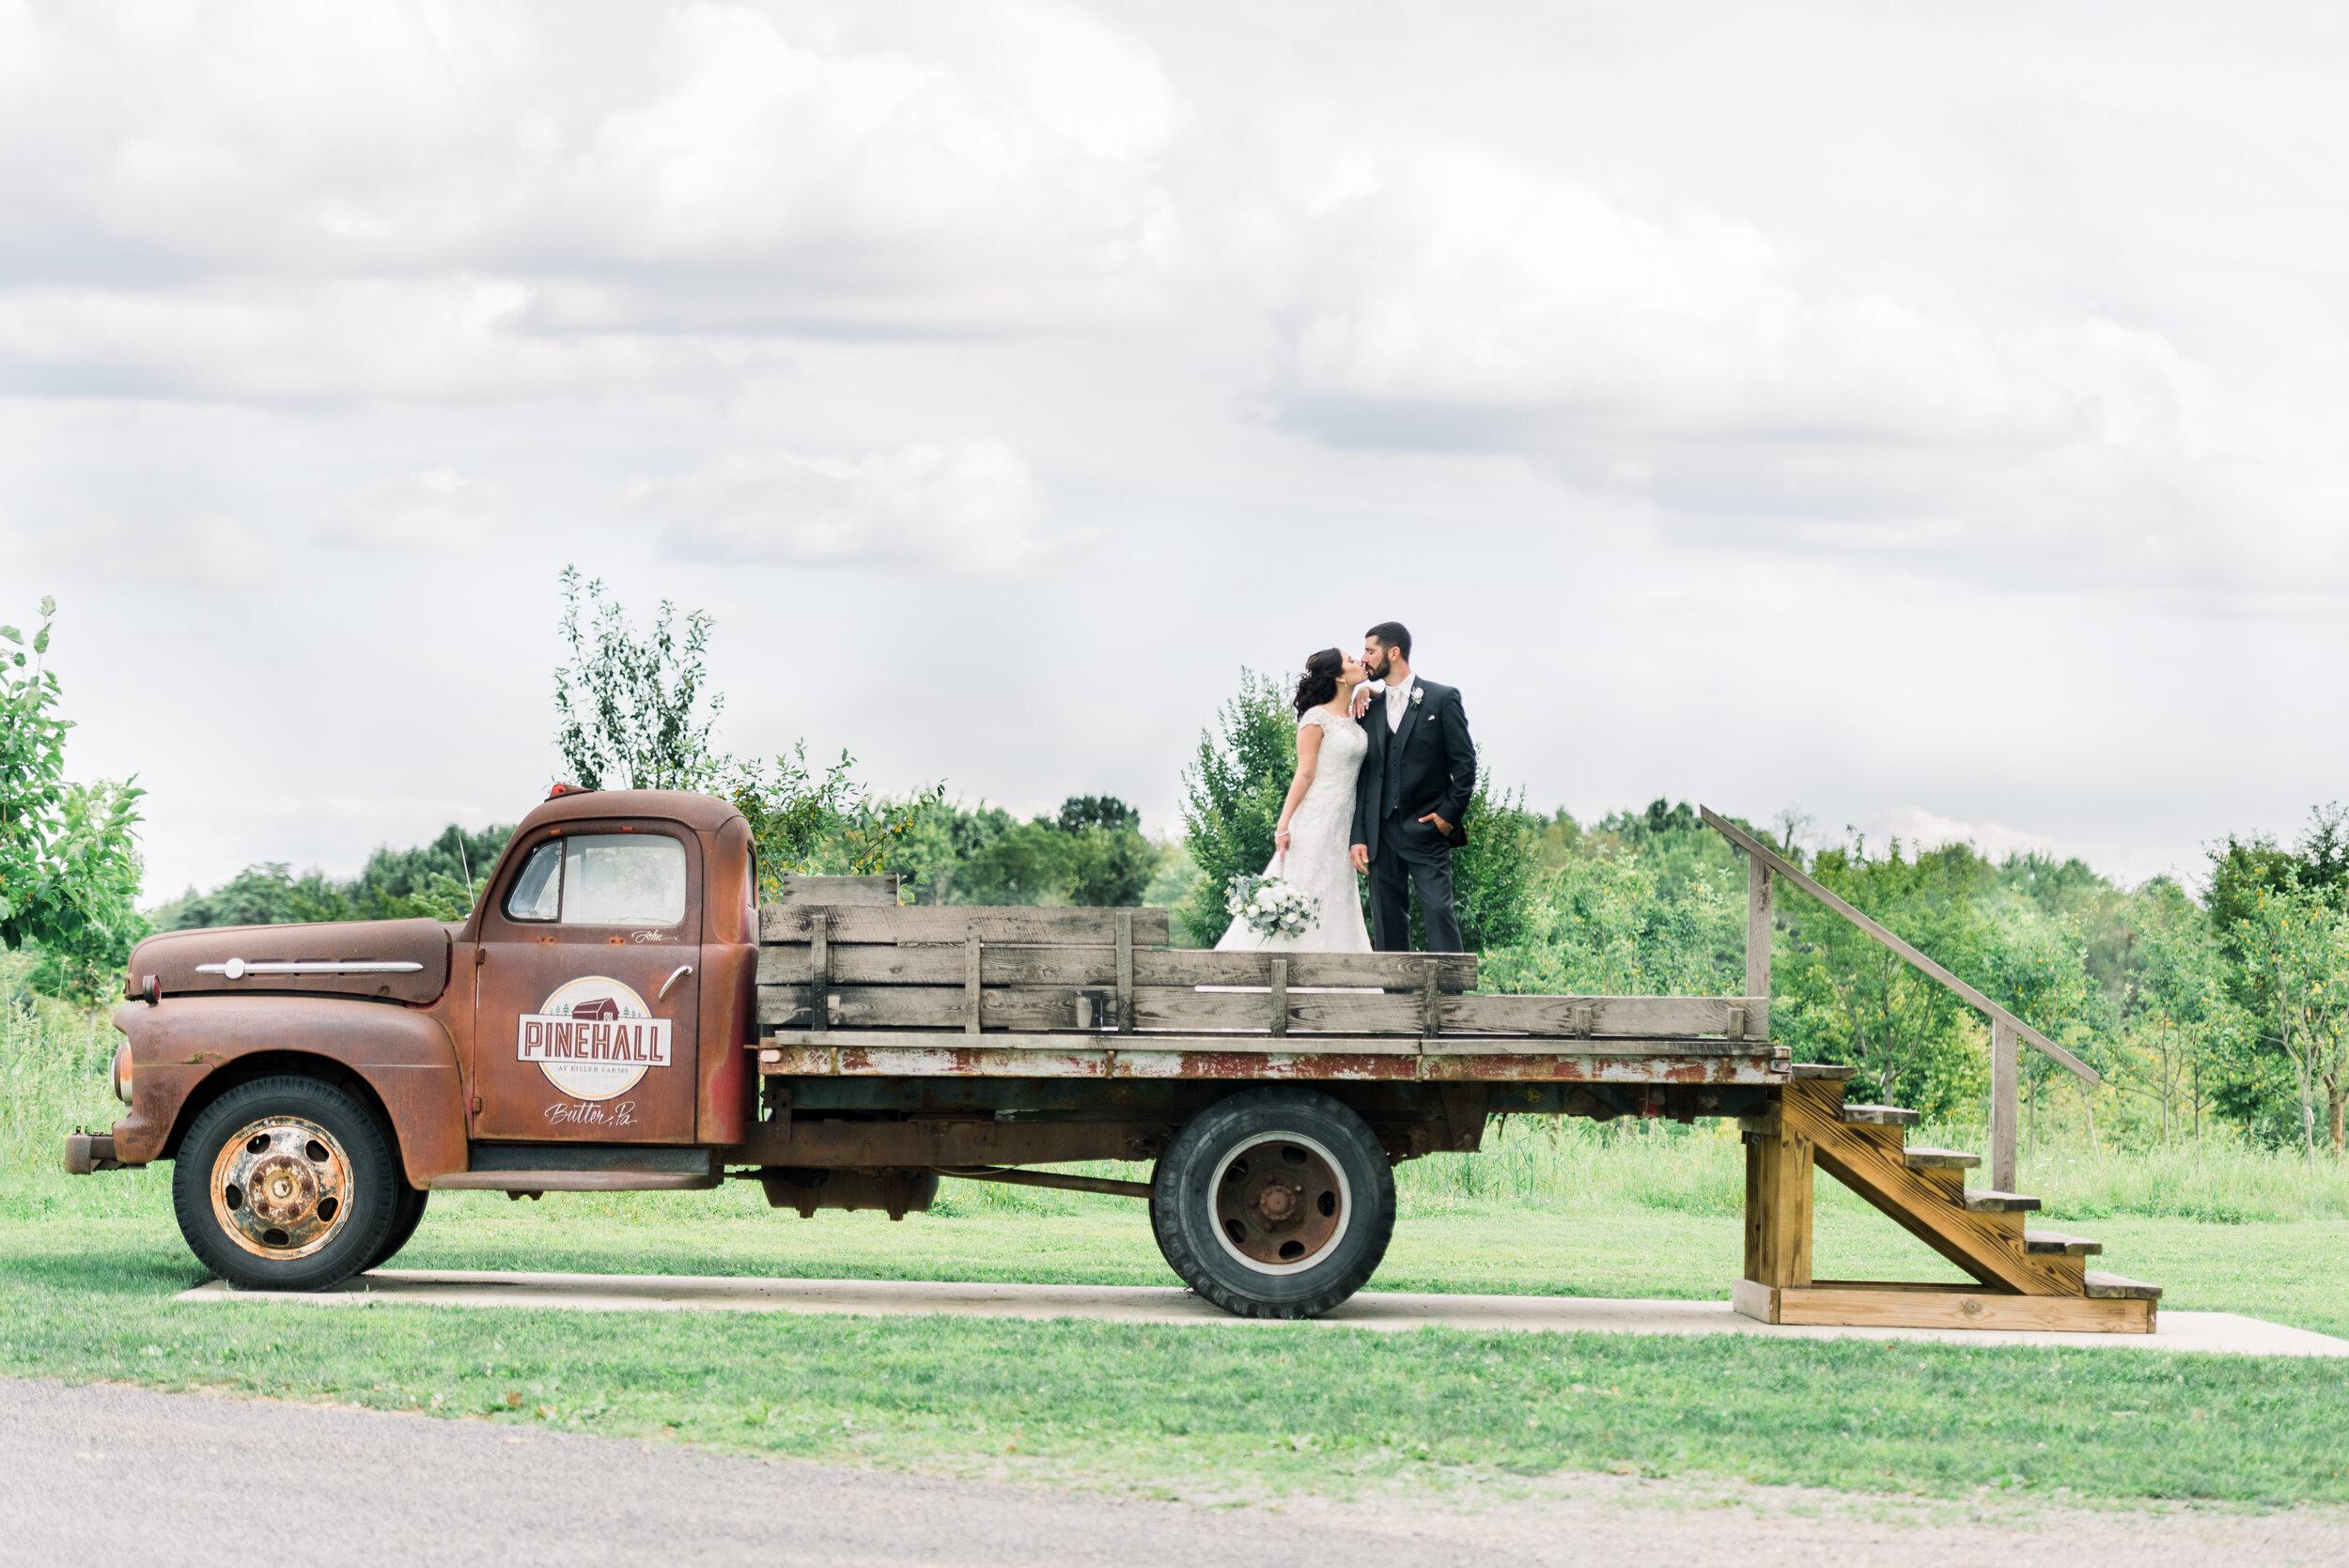 Pinehall-At-Eisler-Farms-Wedding-Ashley-Reed-Photography-28.jpg